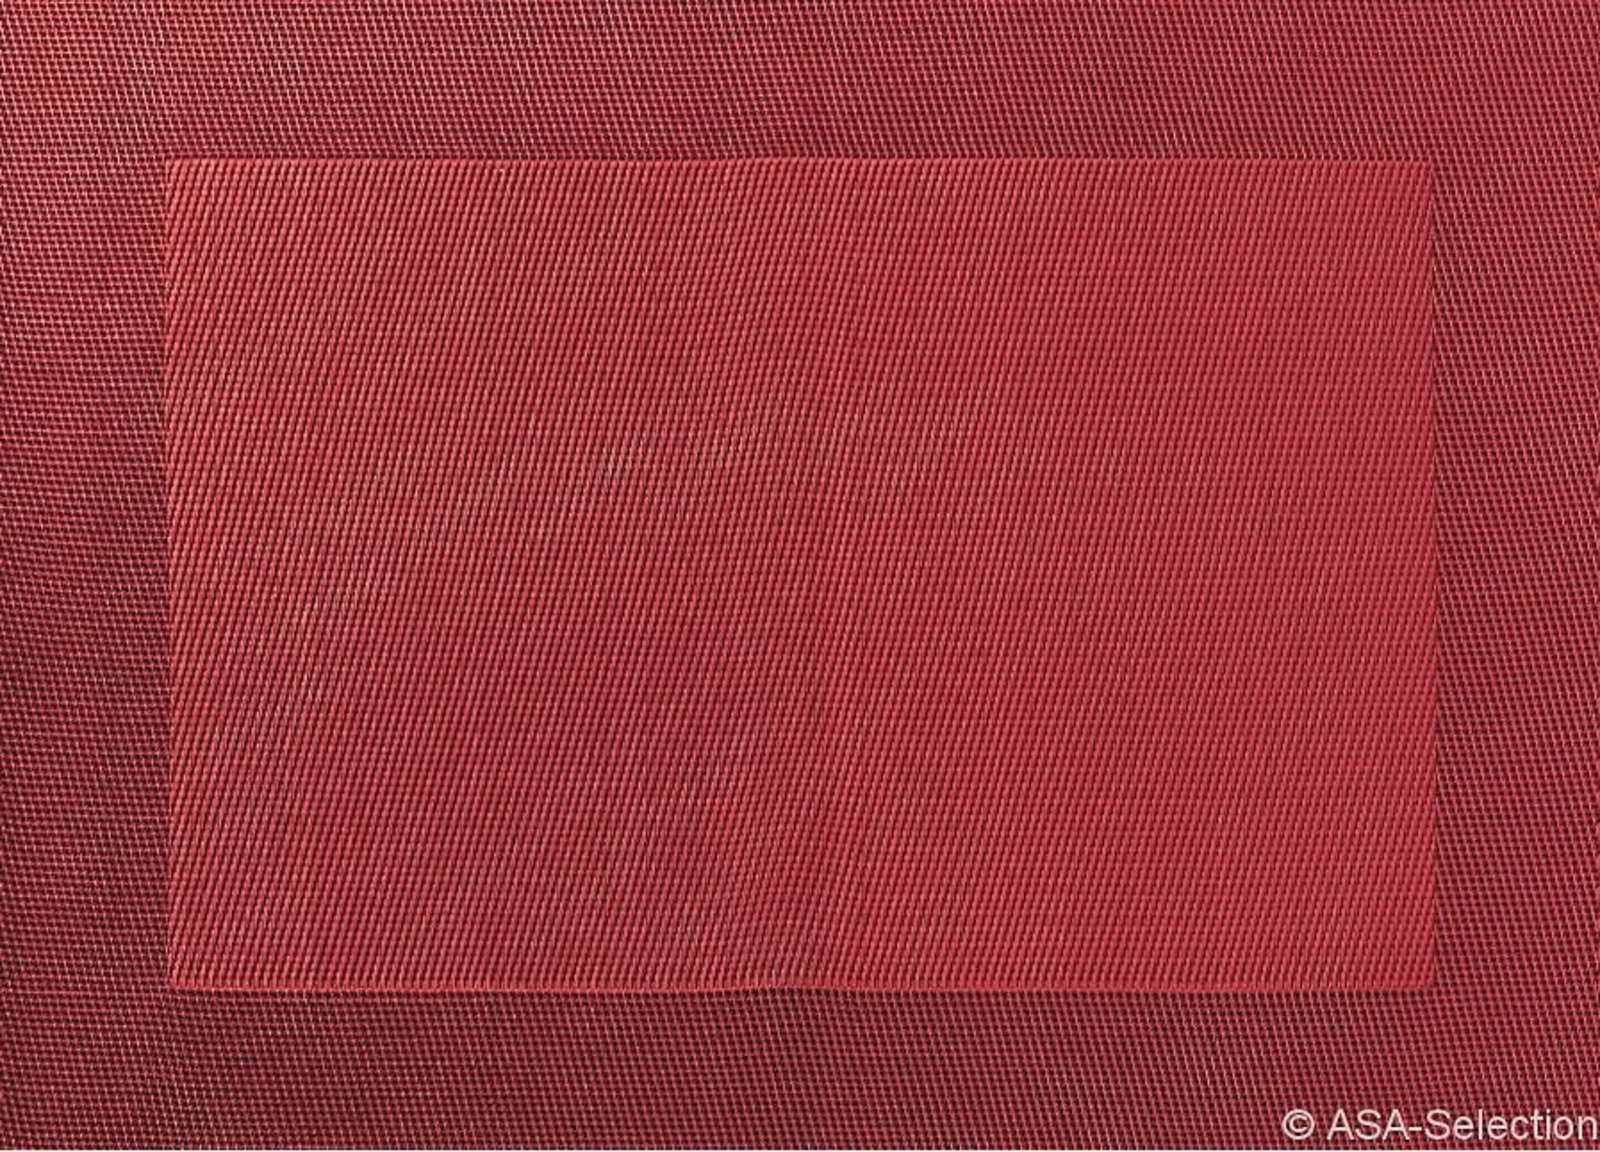 Asa Selection Tischset Rot Online Entdecken Schaffrath Ihr Mobelhaus